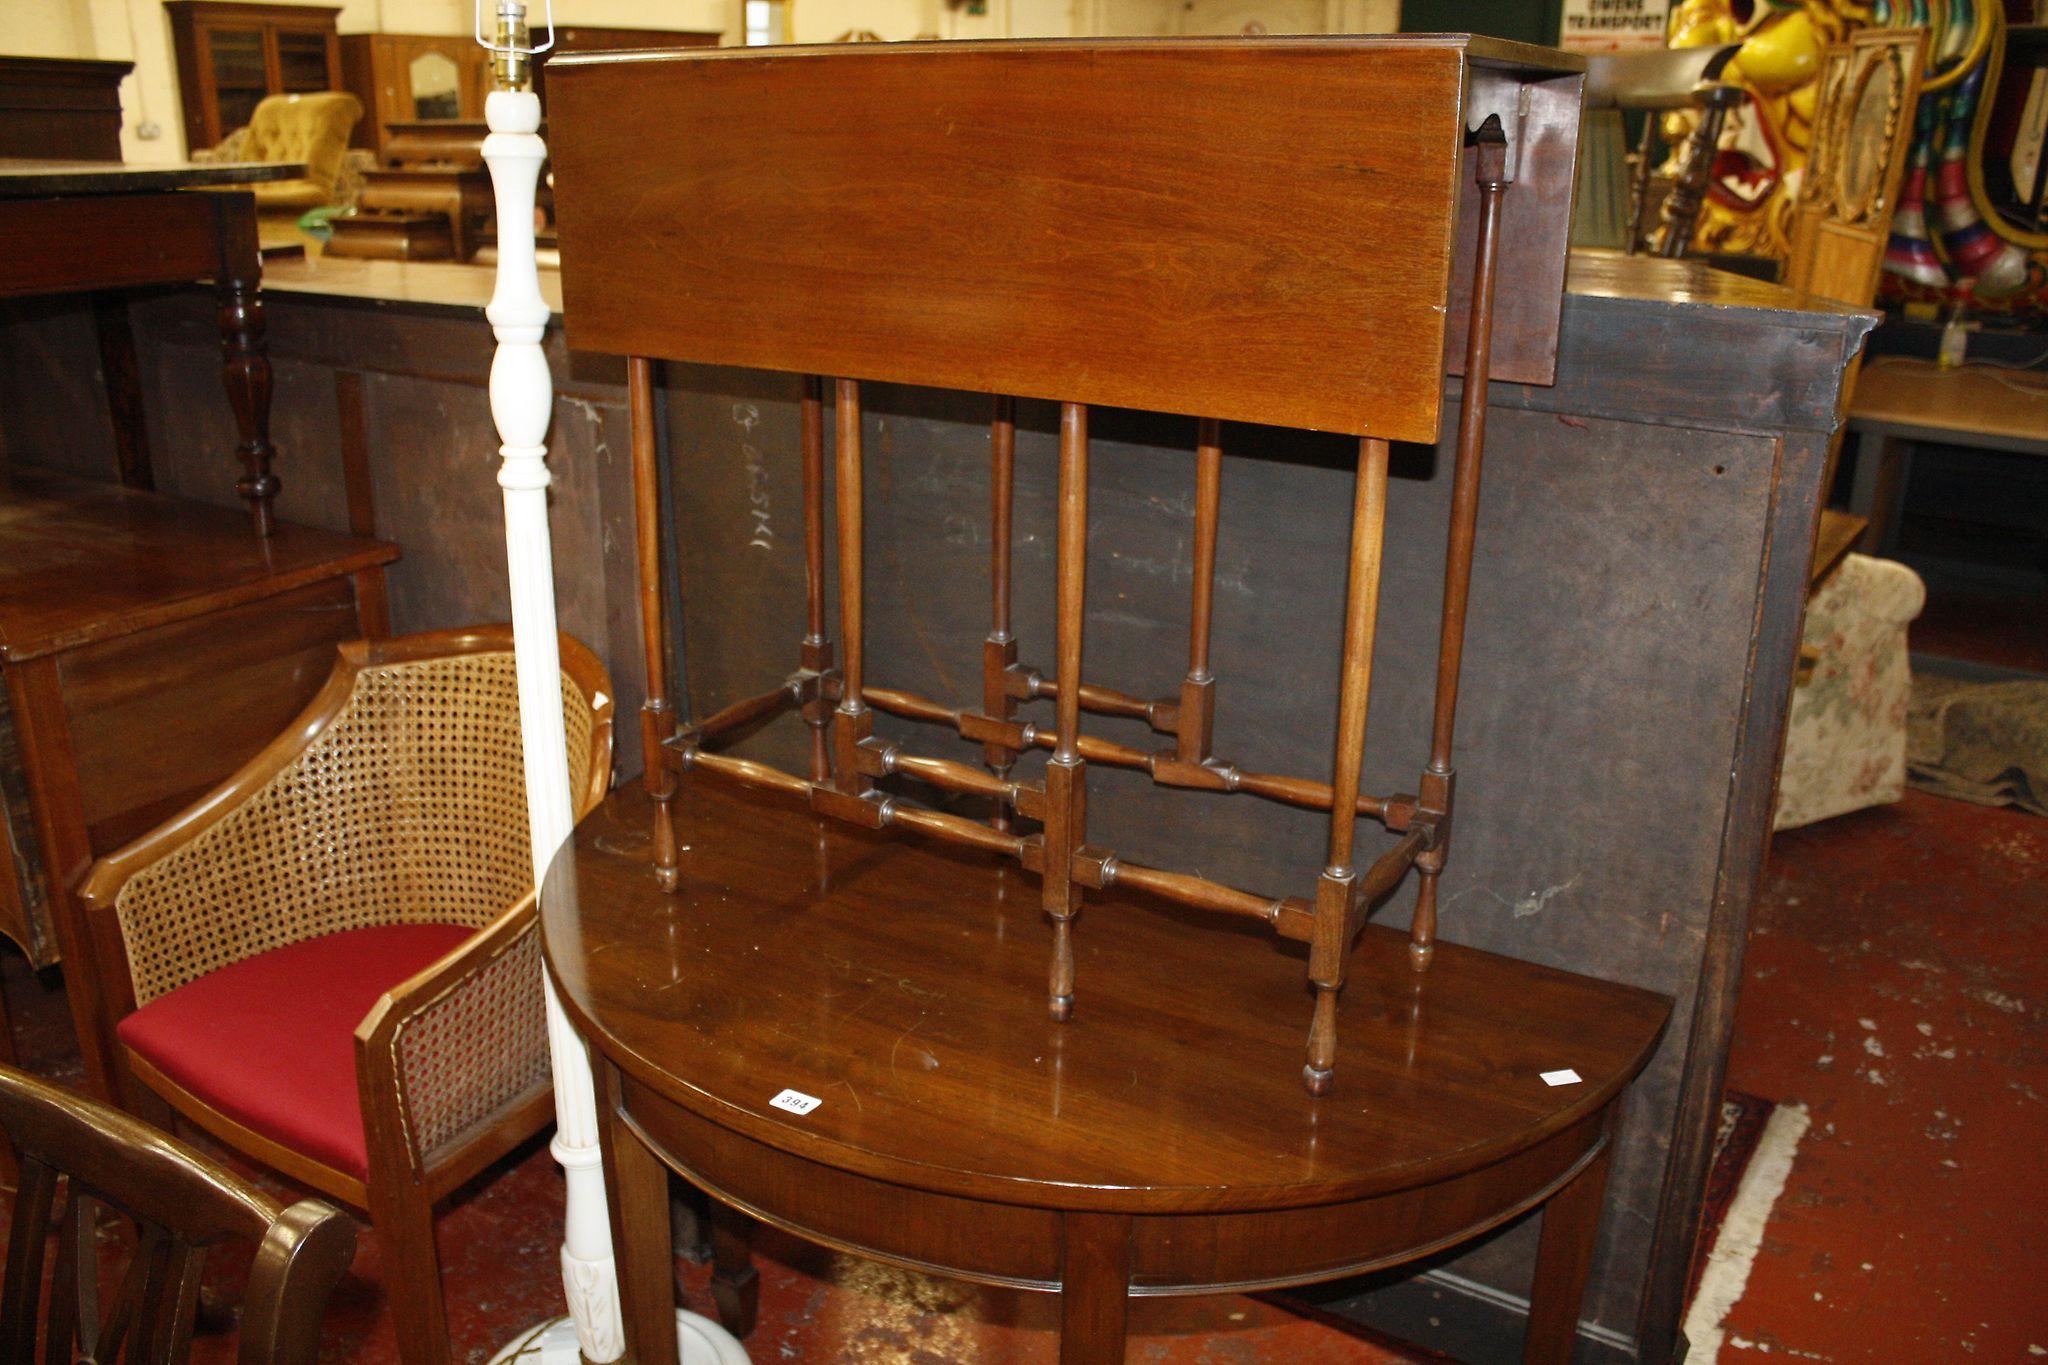 A mahogany spider leg table